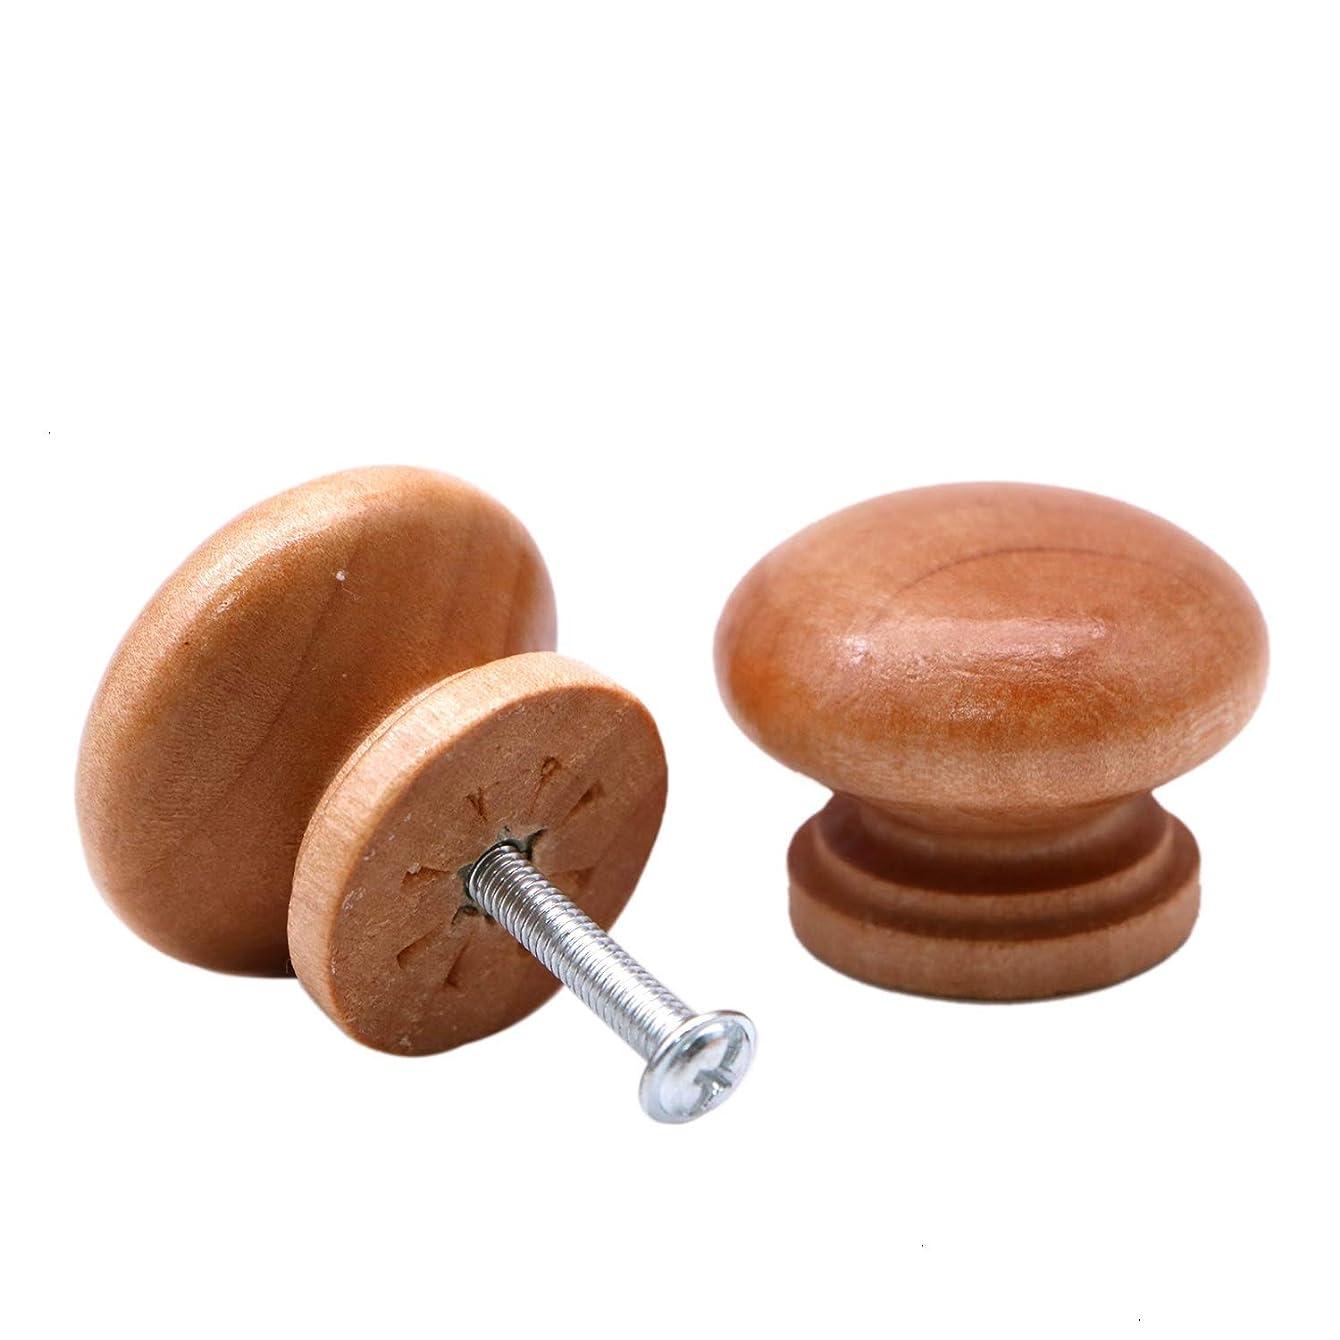 JETEHO Set of 20 Round Wooden Cabinet Knob Cupboard Drawer Wardrobe Door Pull Handle with Steel Screws(Diameter: 1.3 inches Height: 1 inch